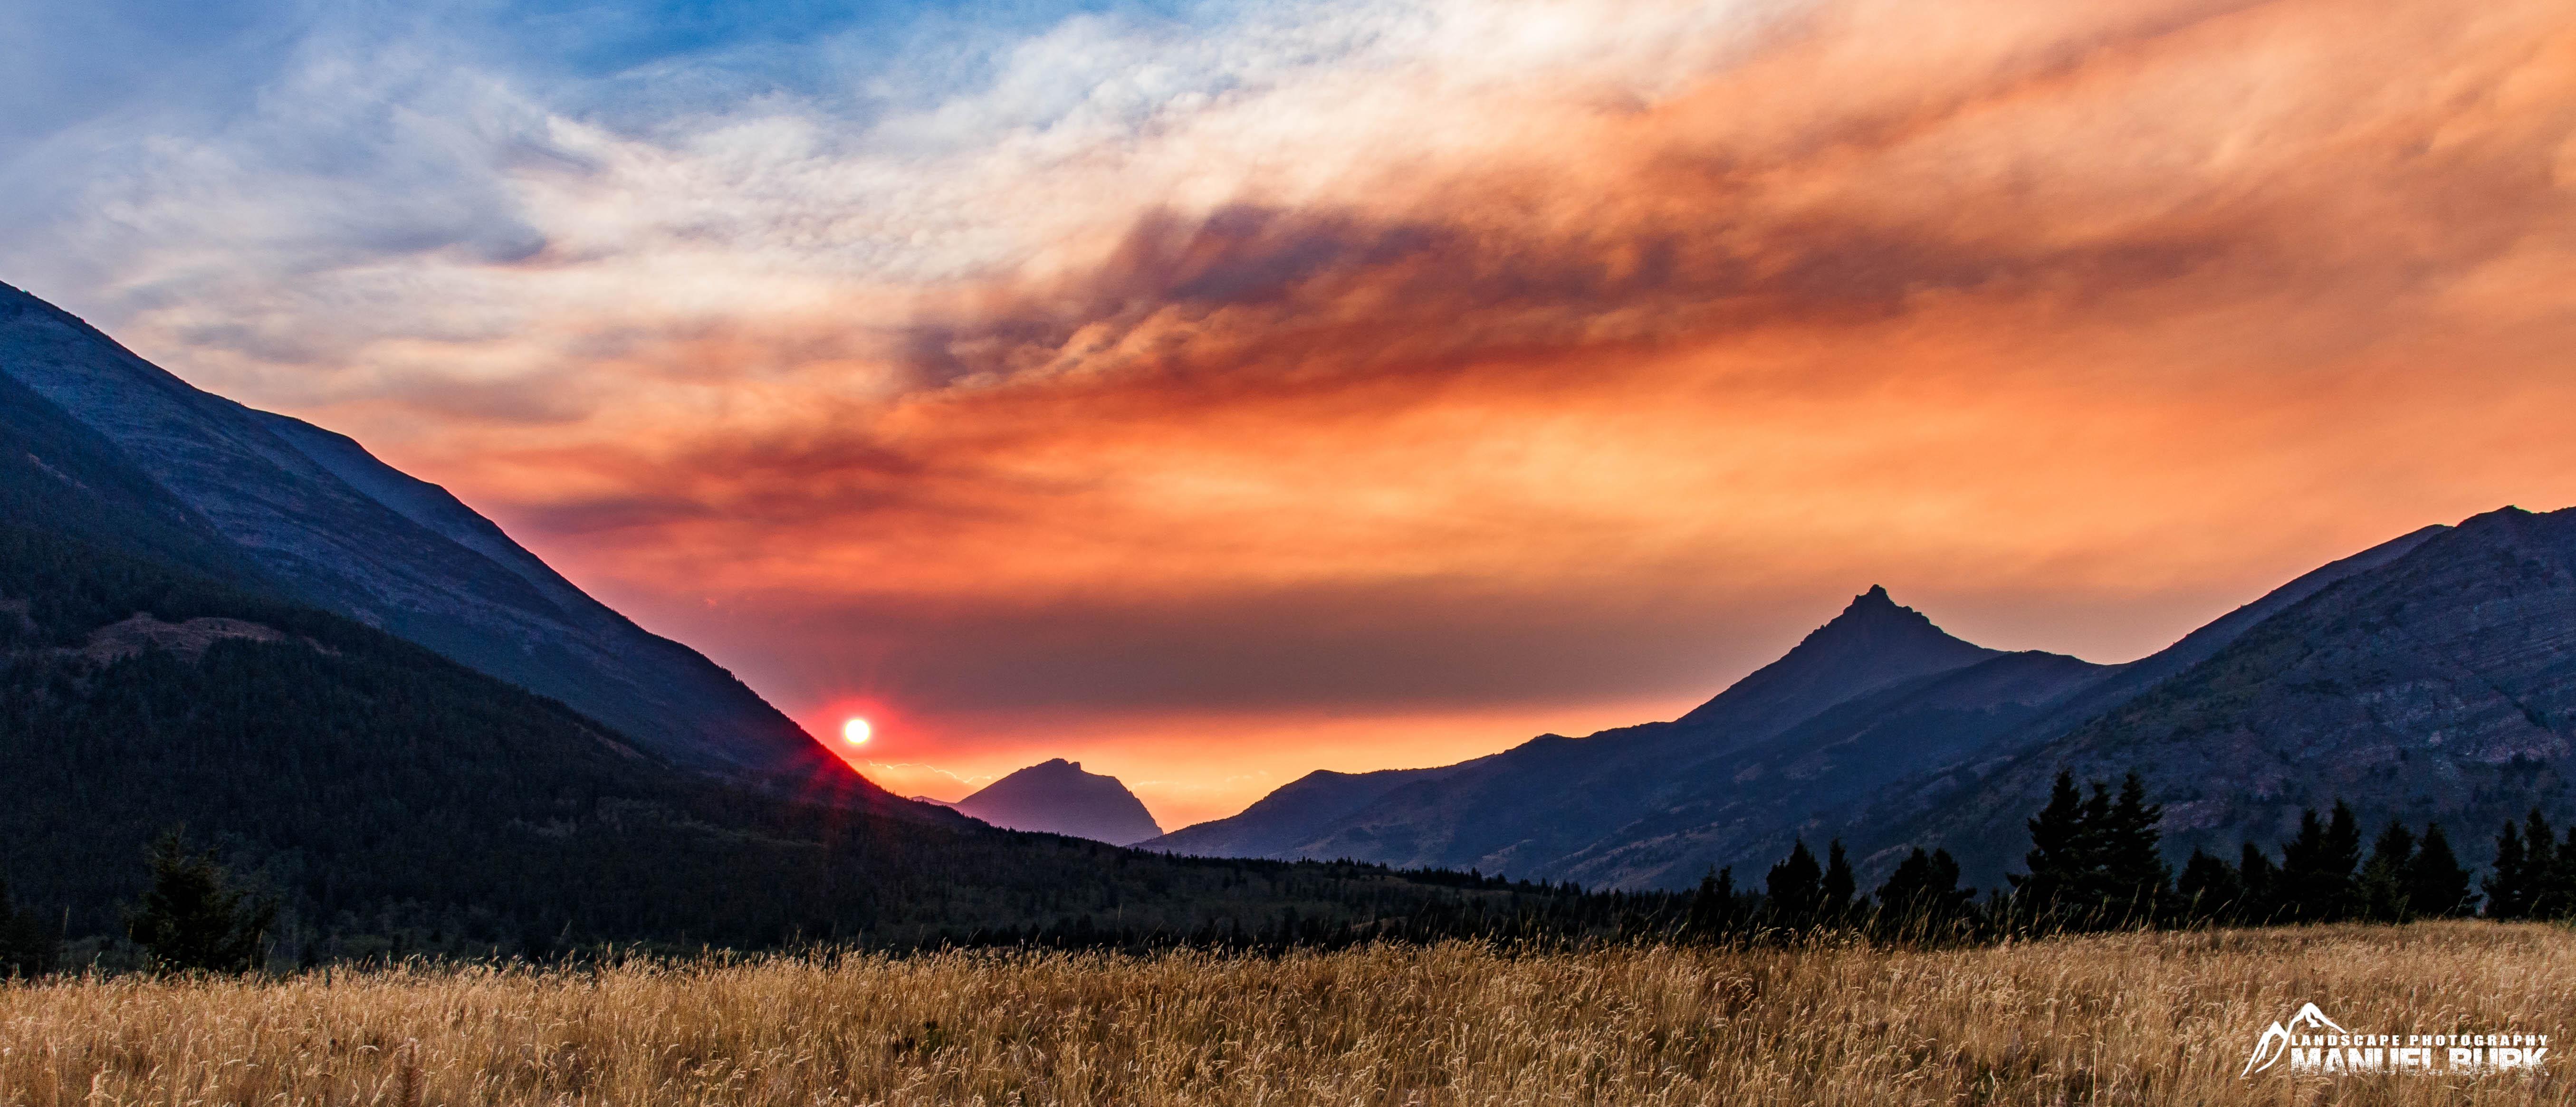 Sonnenuntergang am Rande der Rockys